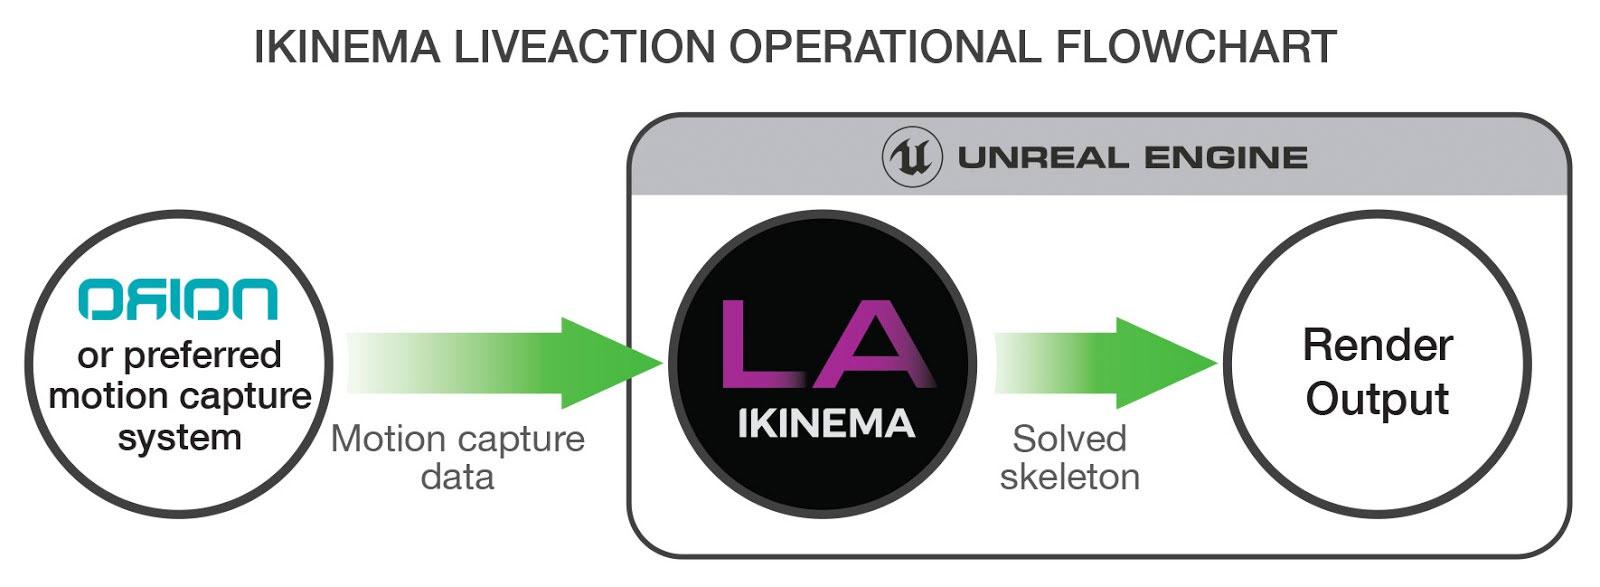 IKINEMA_LiveAction_Flowchart.jpg